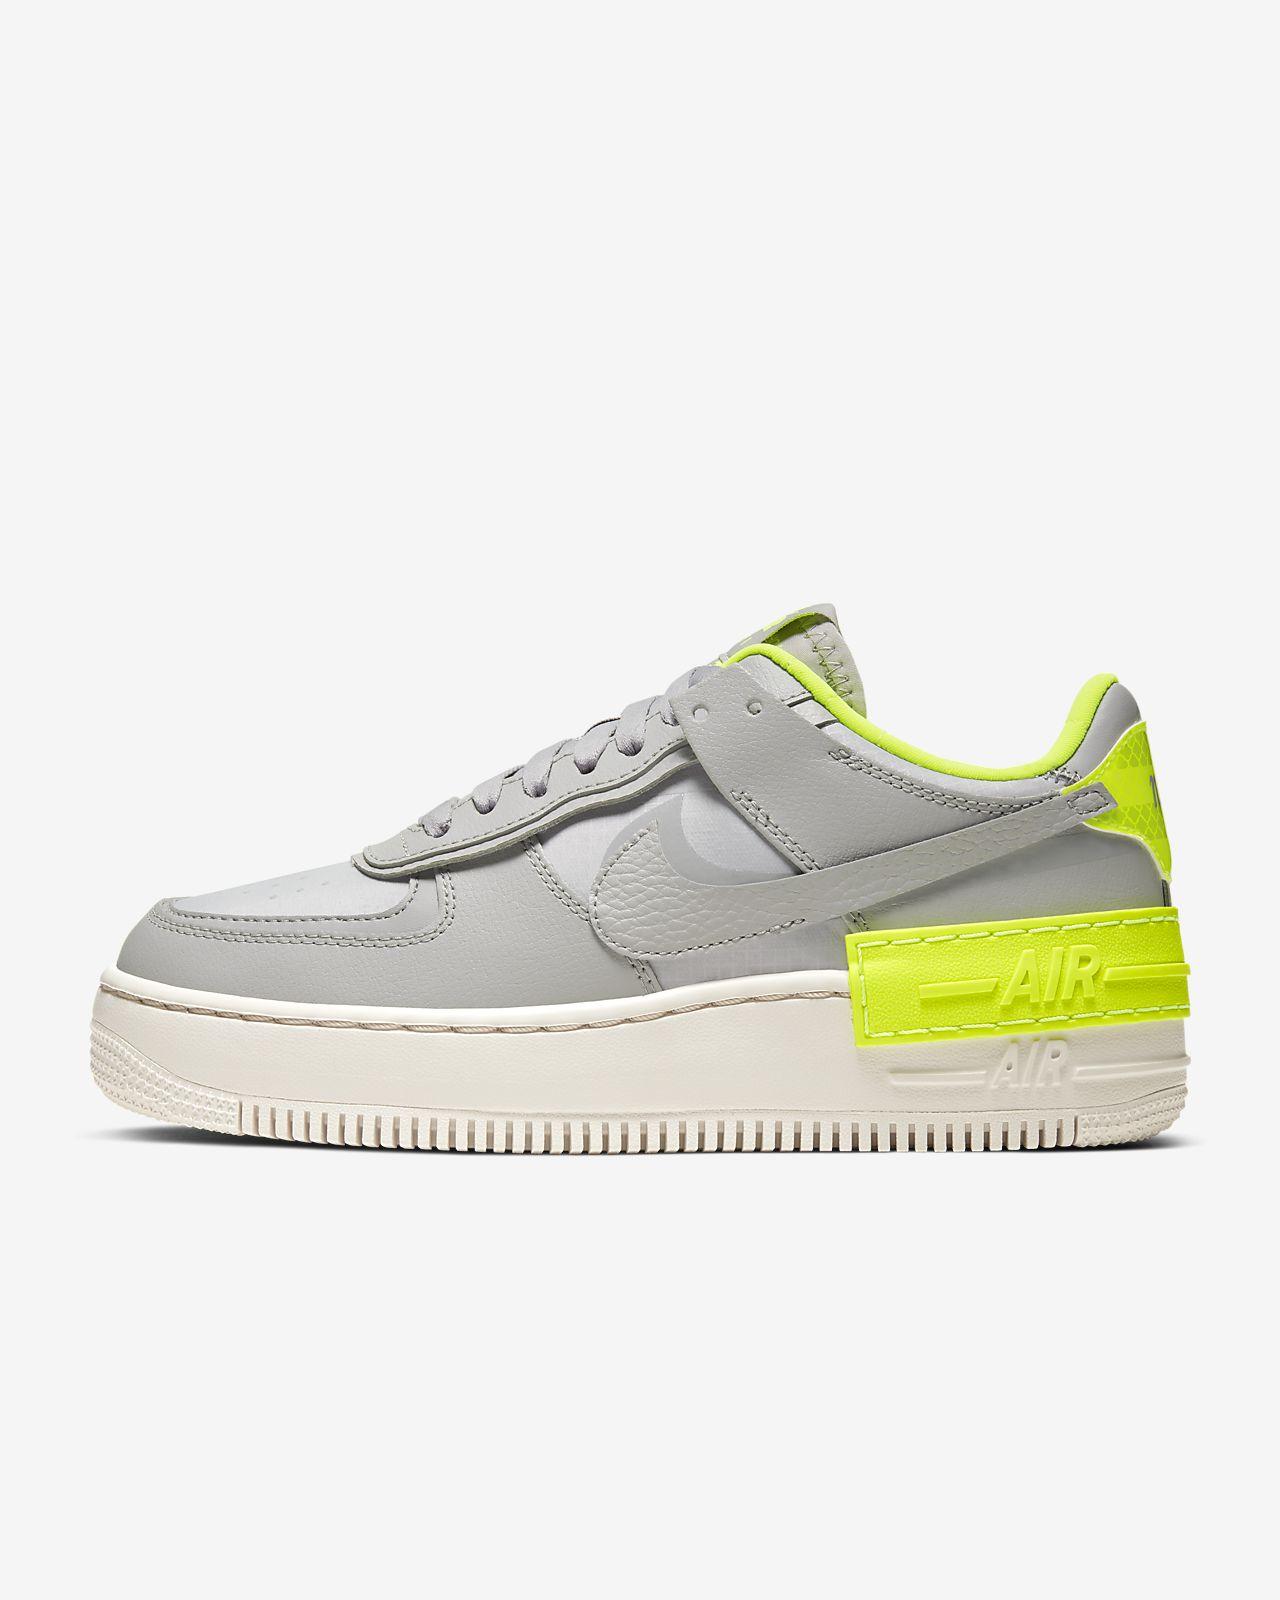 Calzado para mujer Nike AF1 Shadow SE